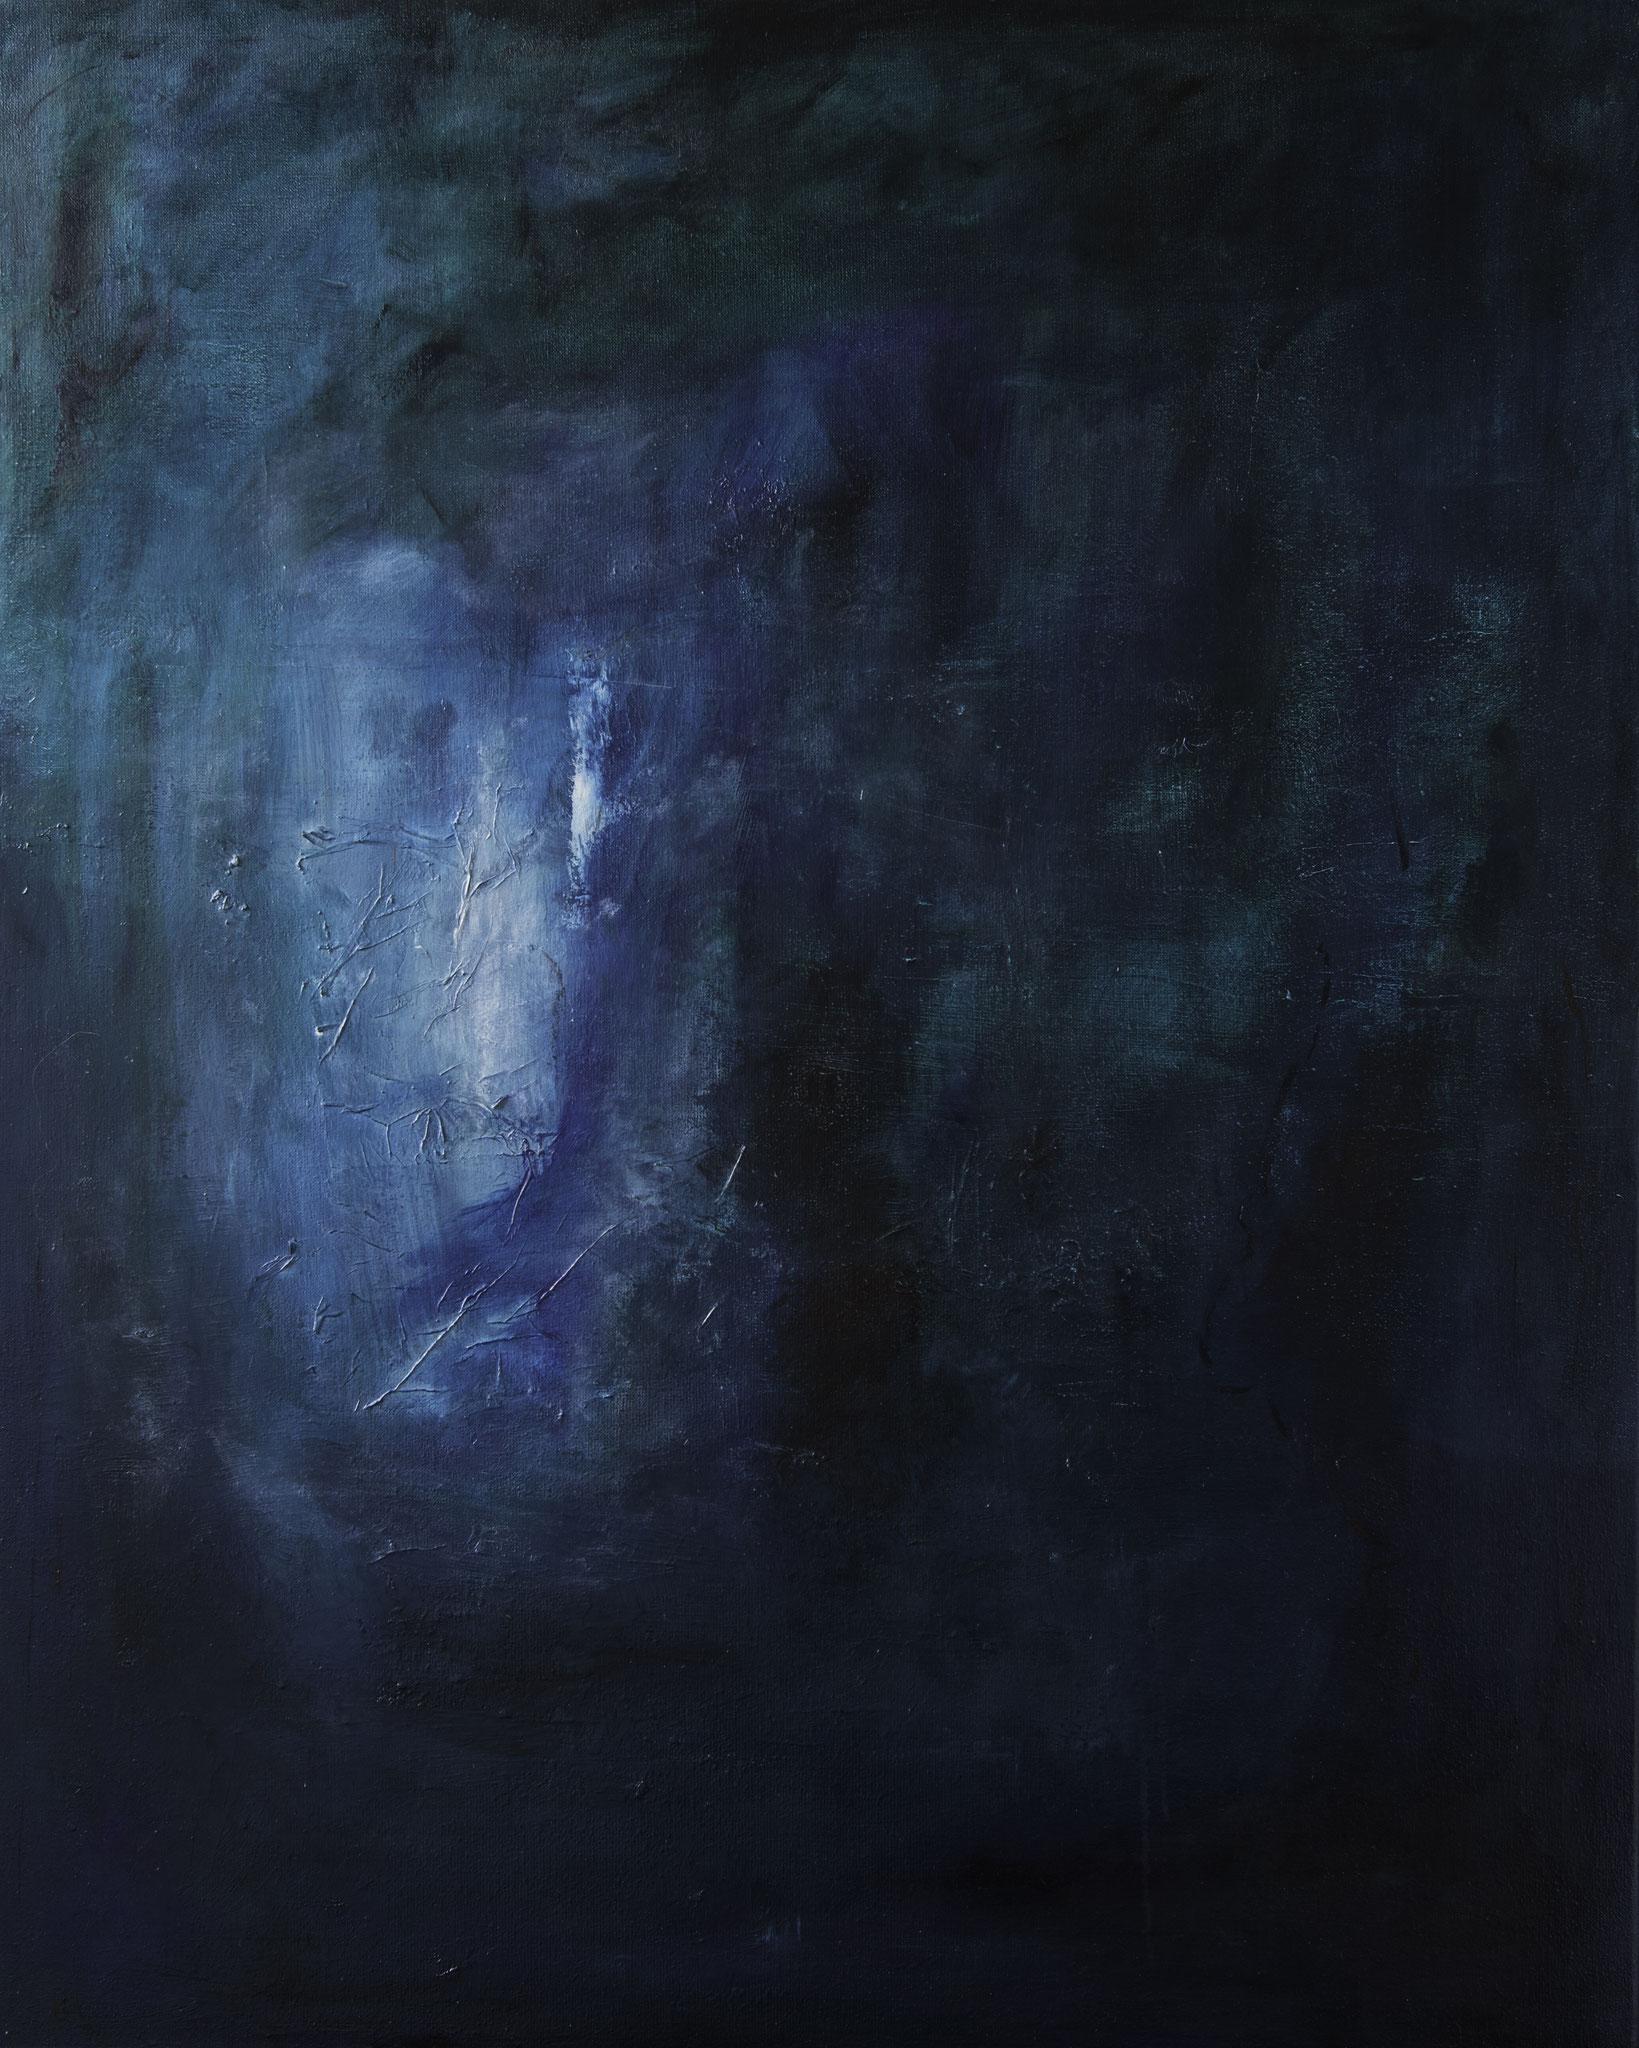 Flickering in the gloom - 80 x 100 cm